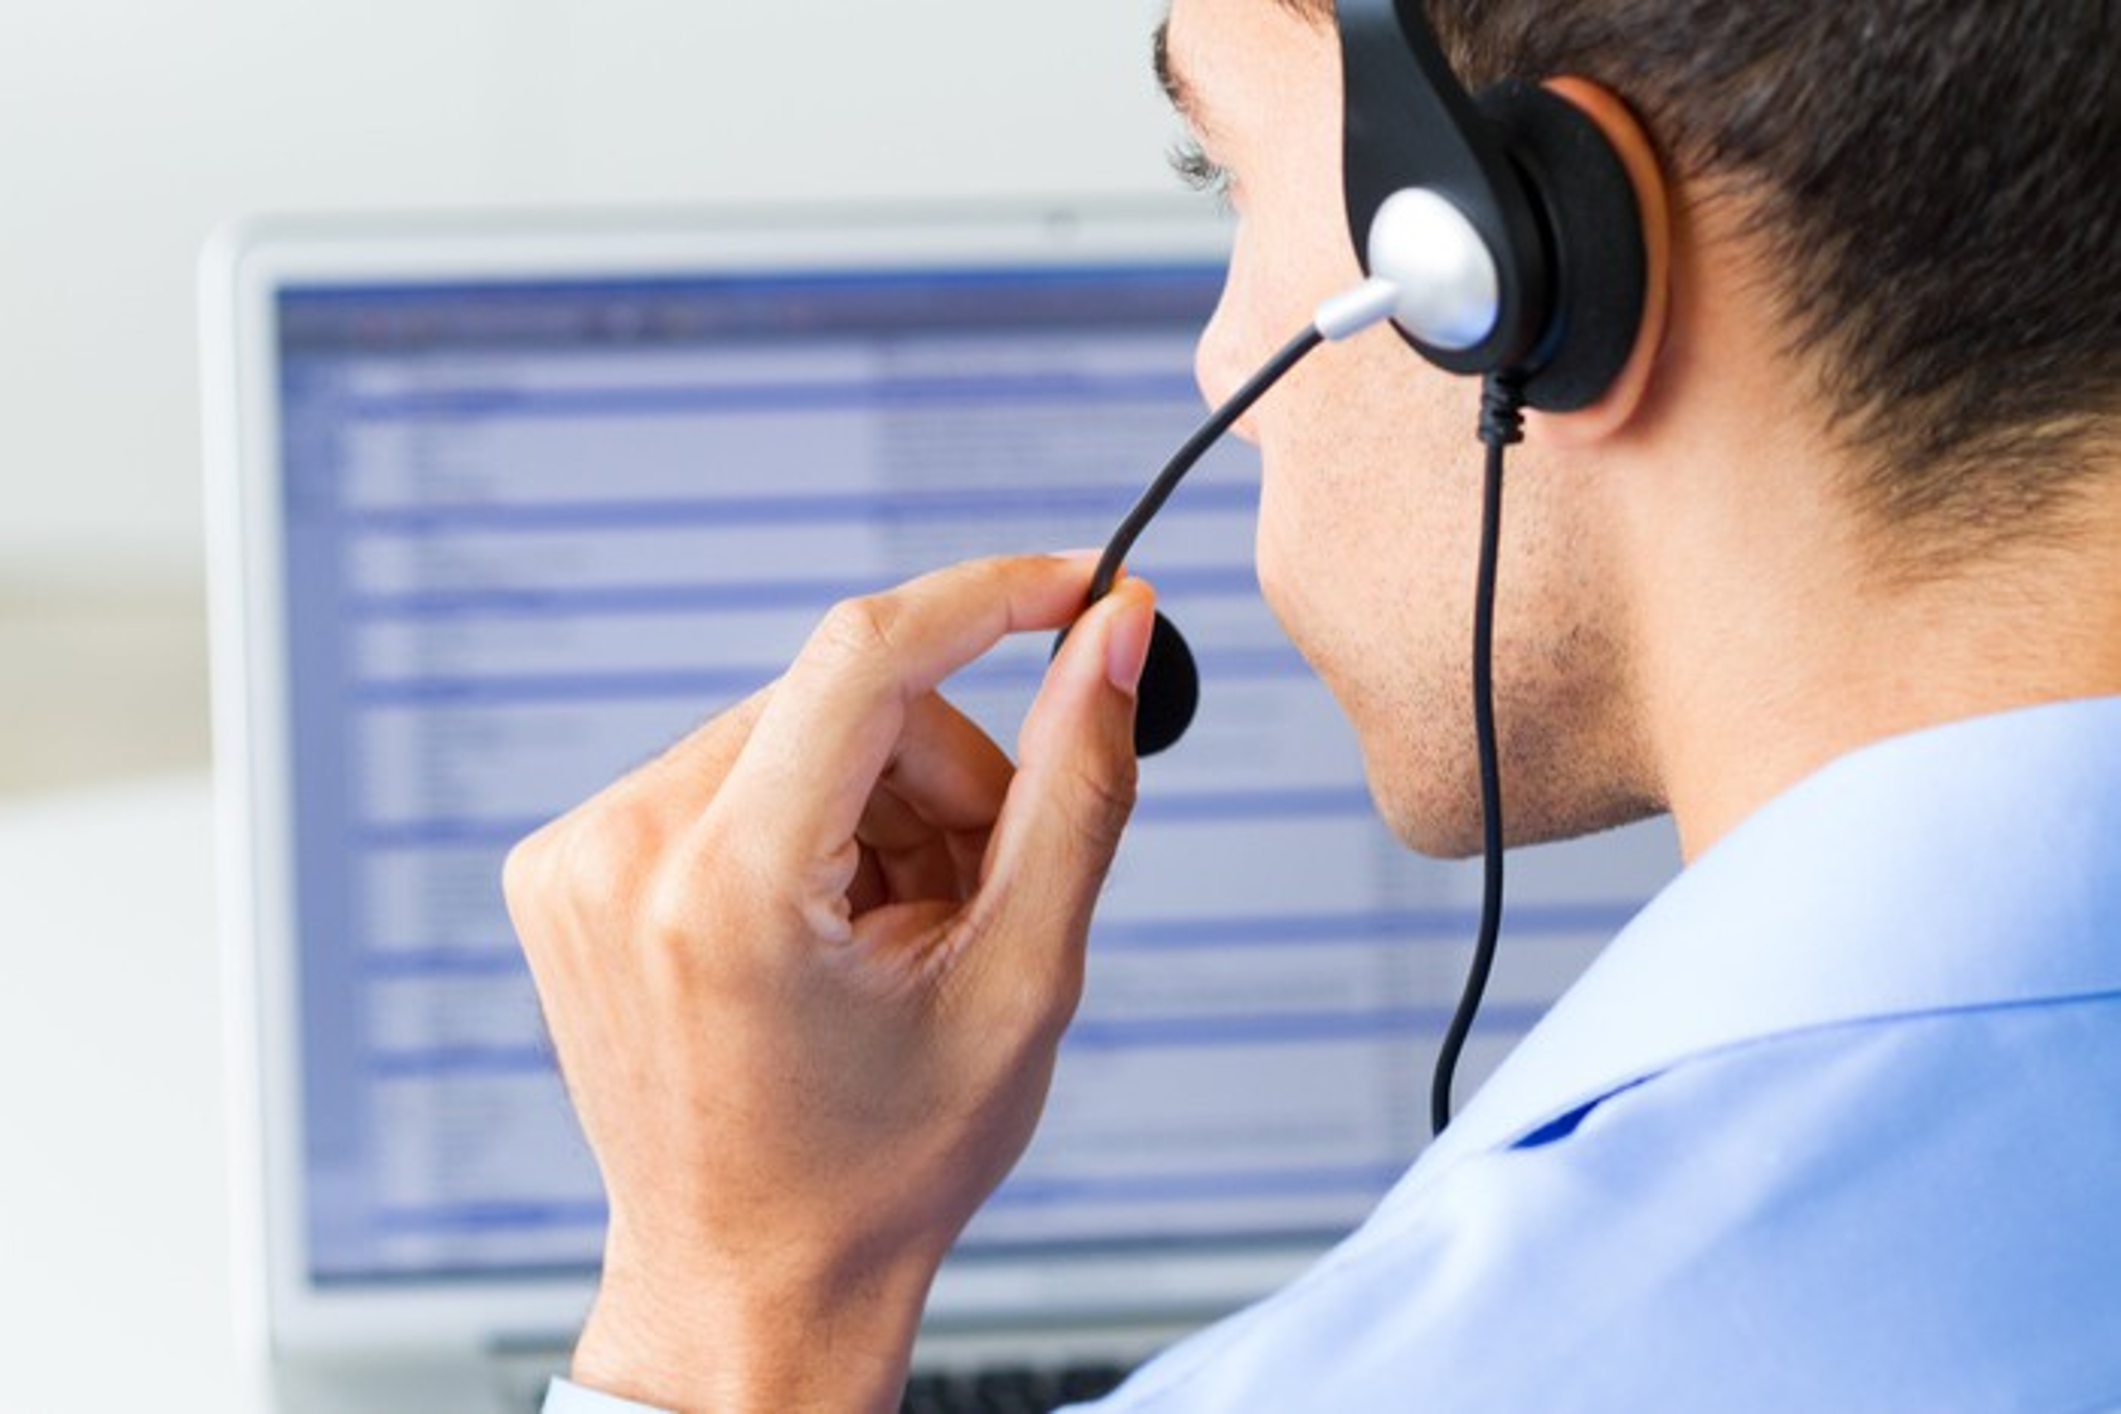 A customer service representative on the phone.